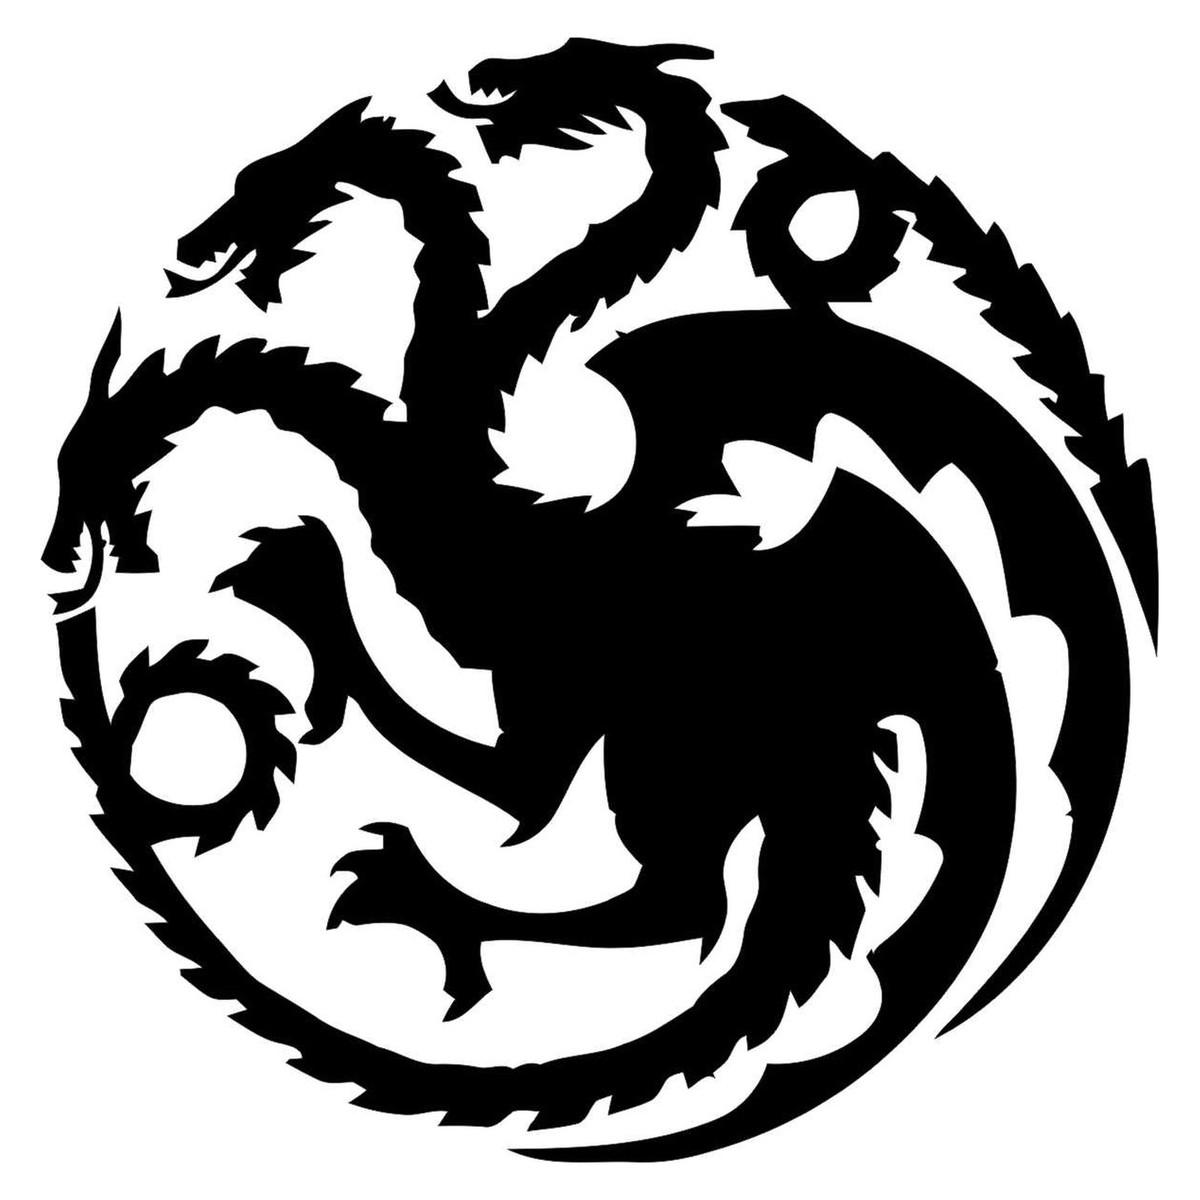 Bolo Game Of Thrones PNGBolo Game Of Thrones PNG